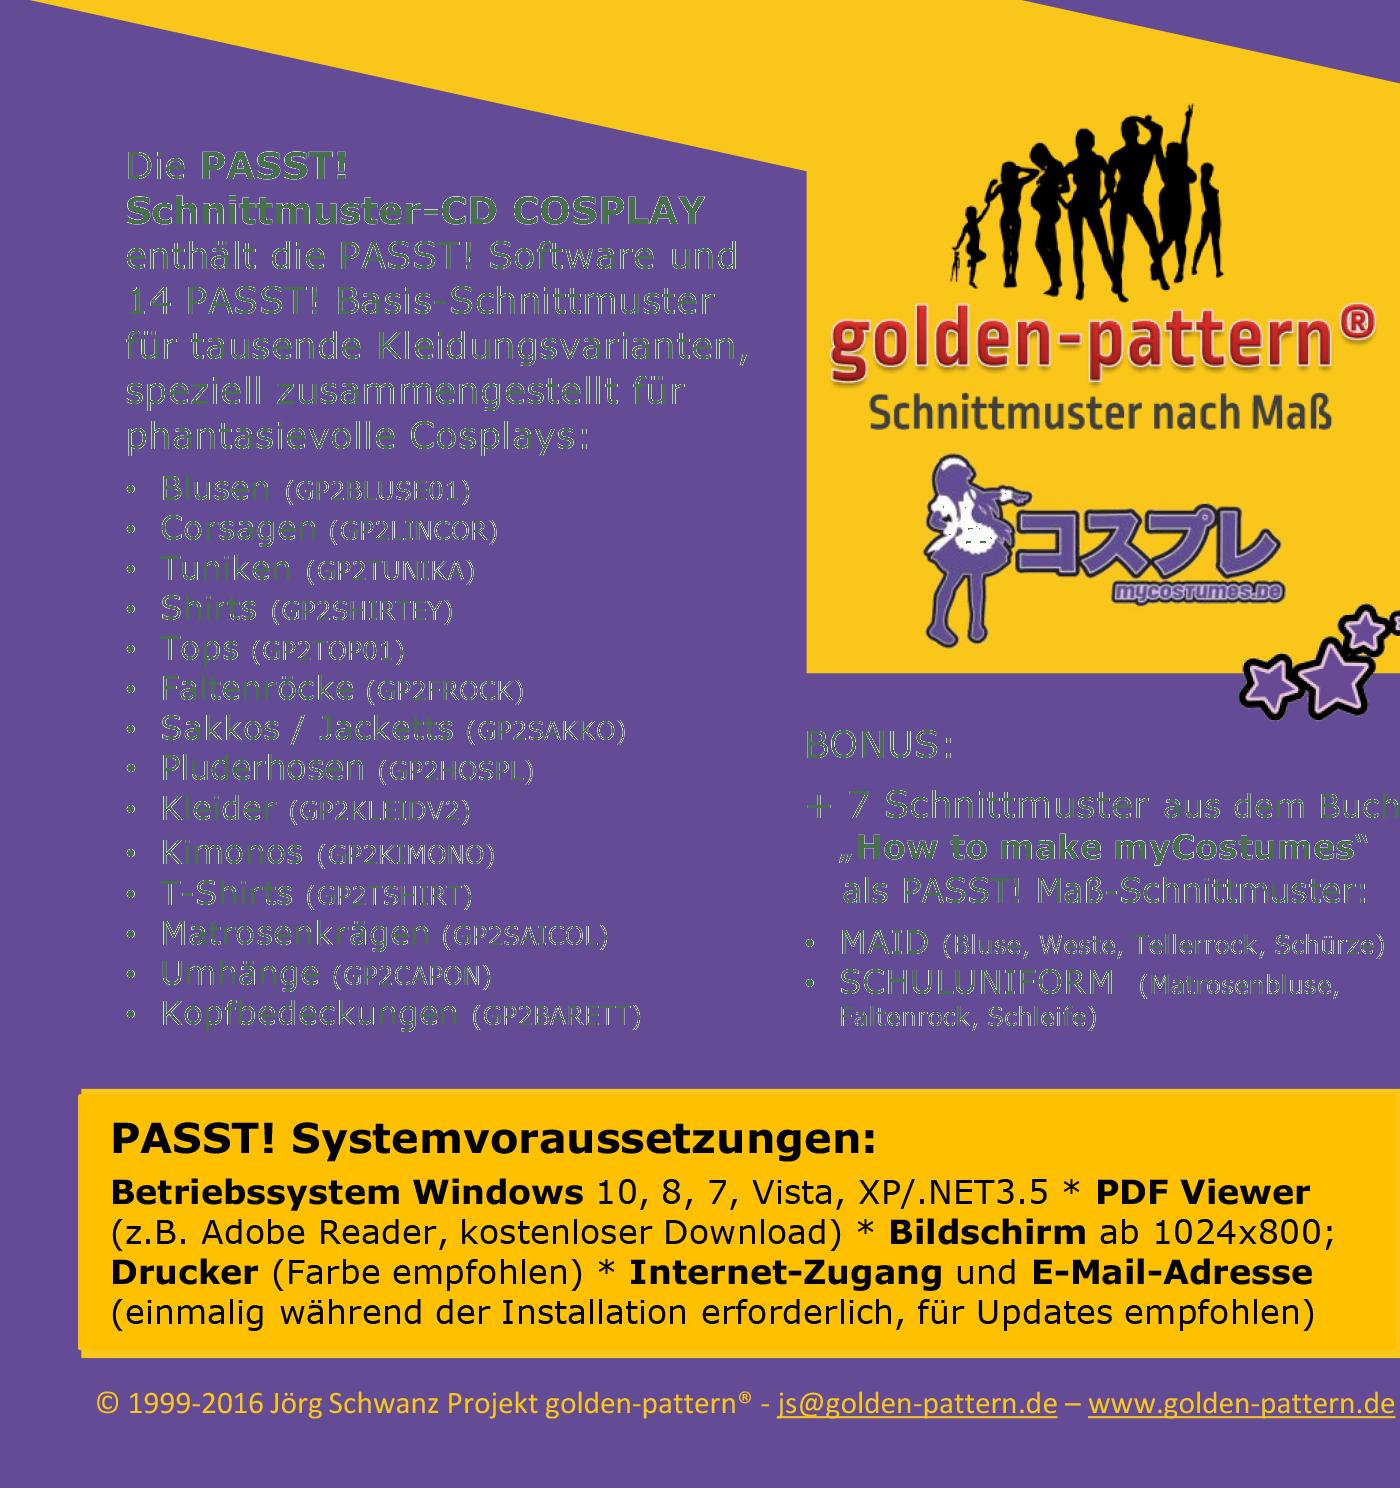 Passt! myCostumes Cosplay Schnittmuster-CD   Schnittmuster - PASST ...